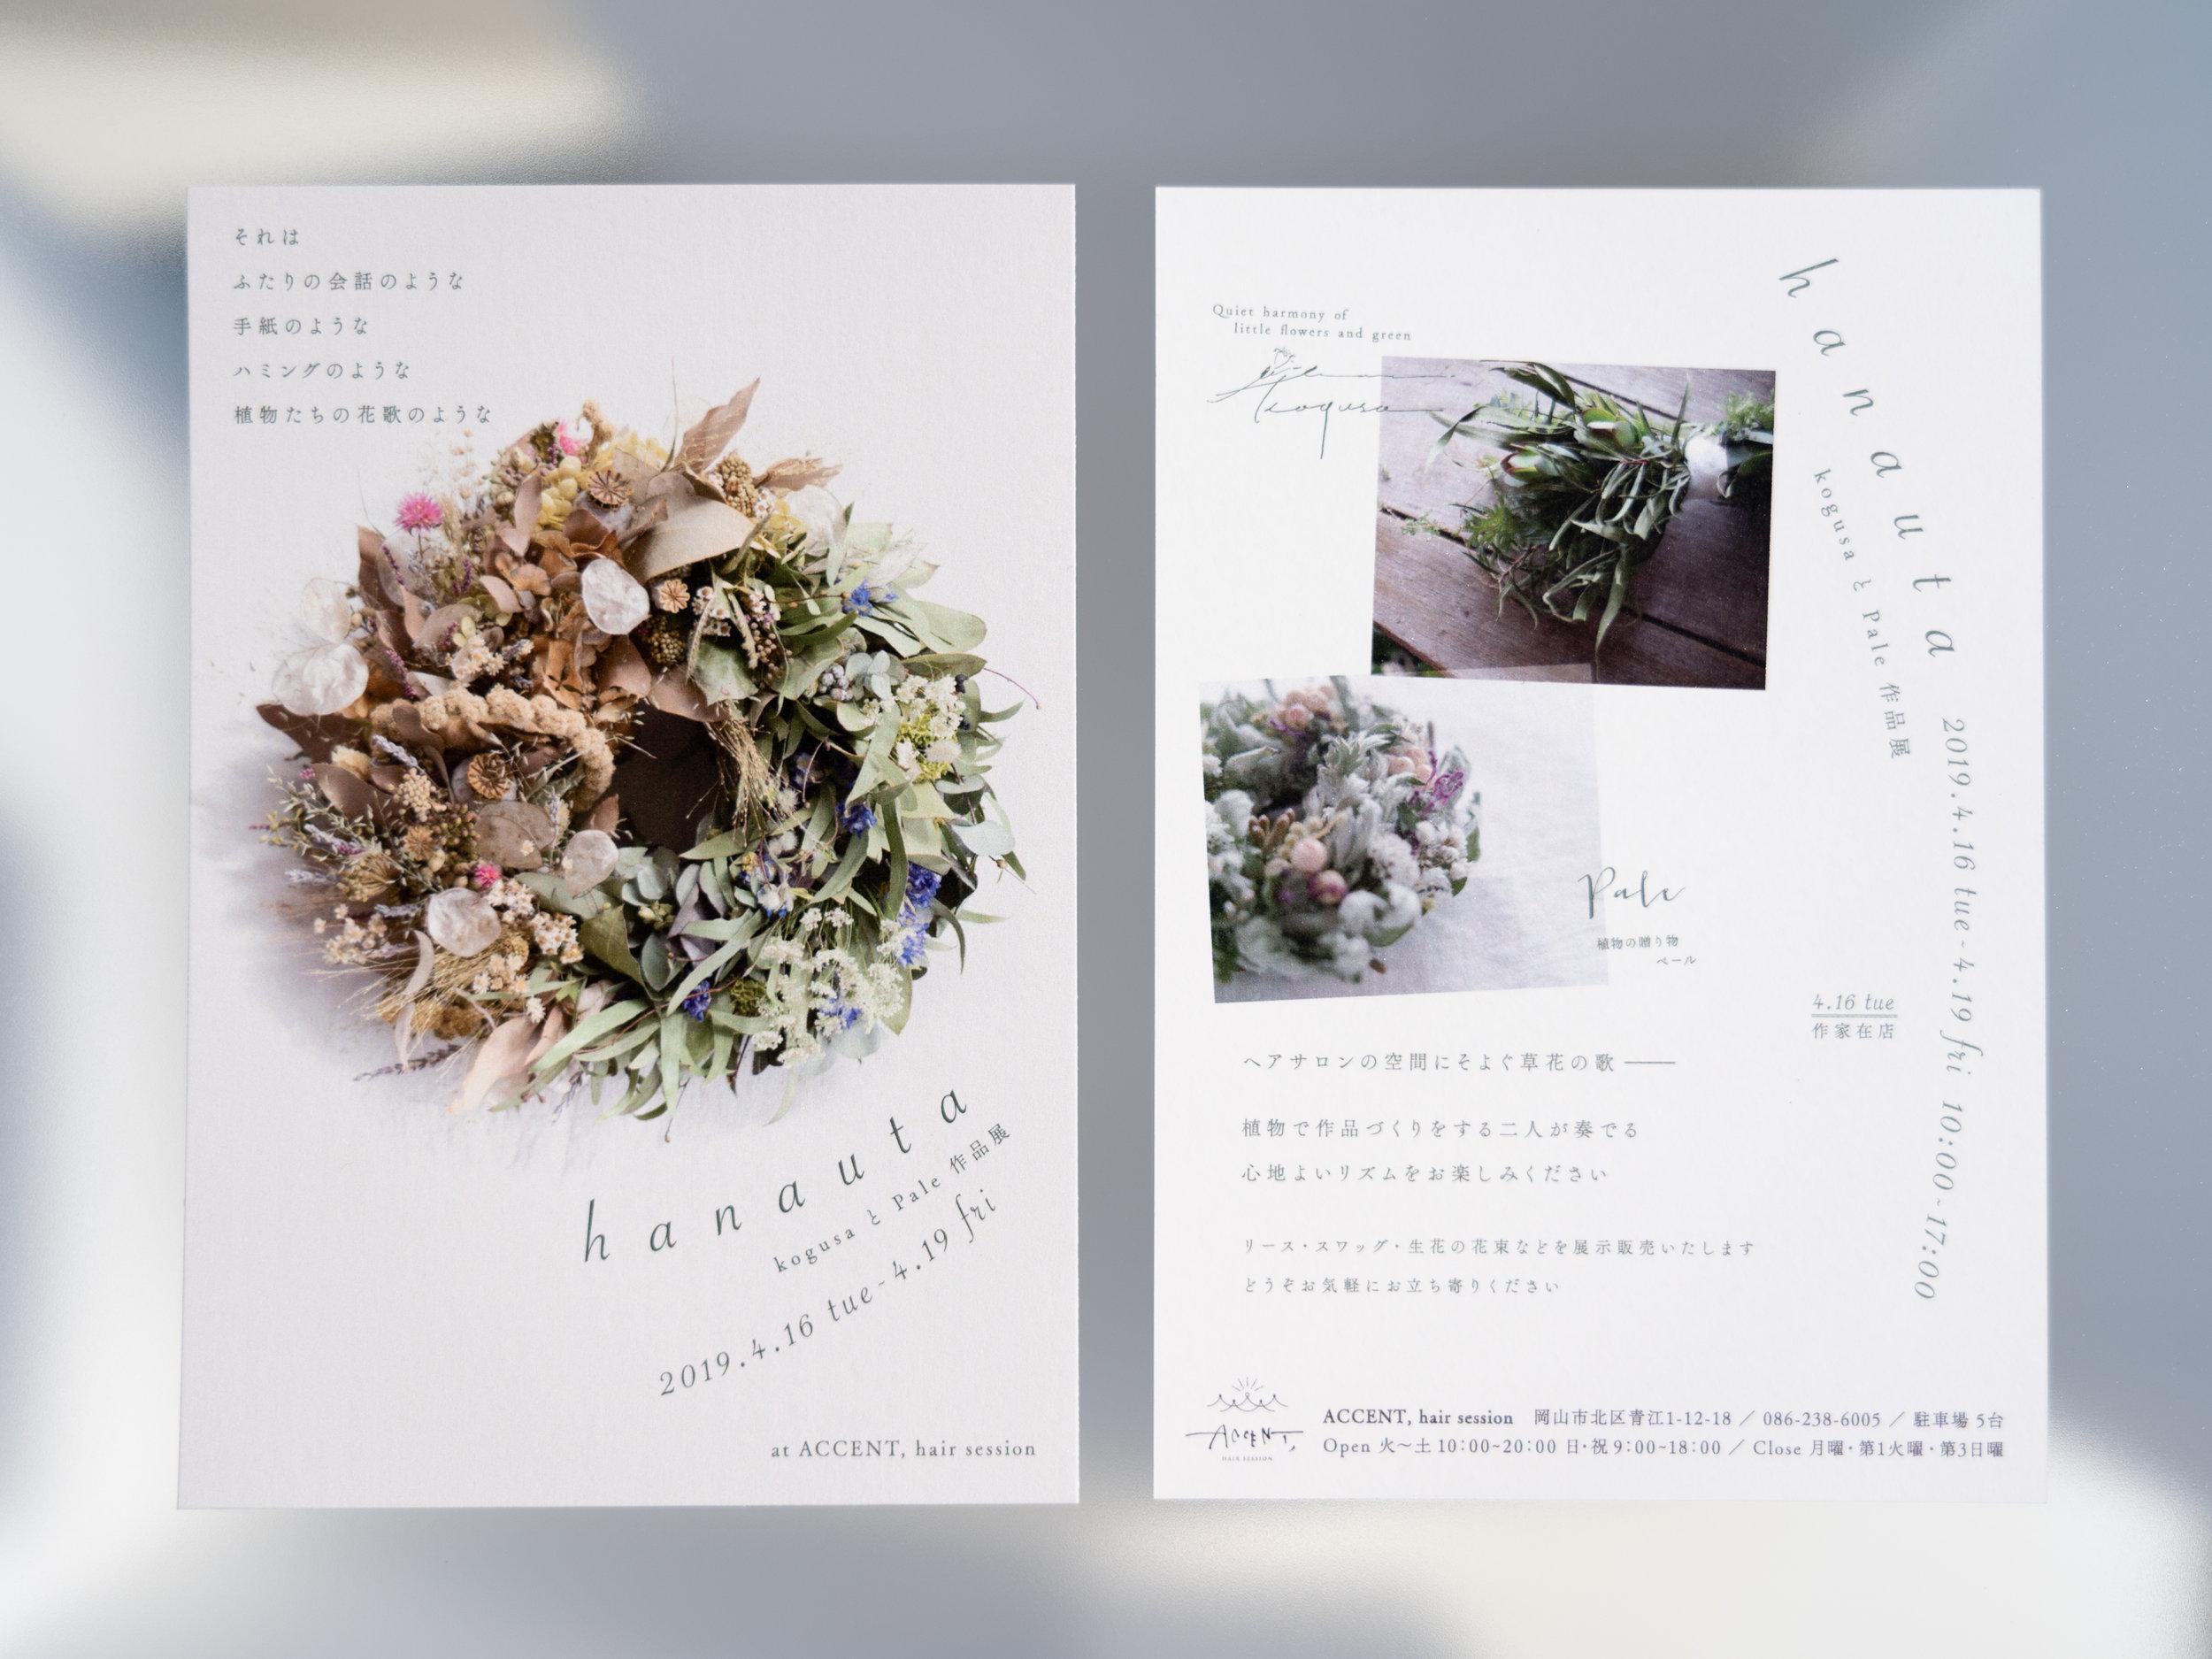 hanauta_DSC01204.jpg